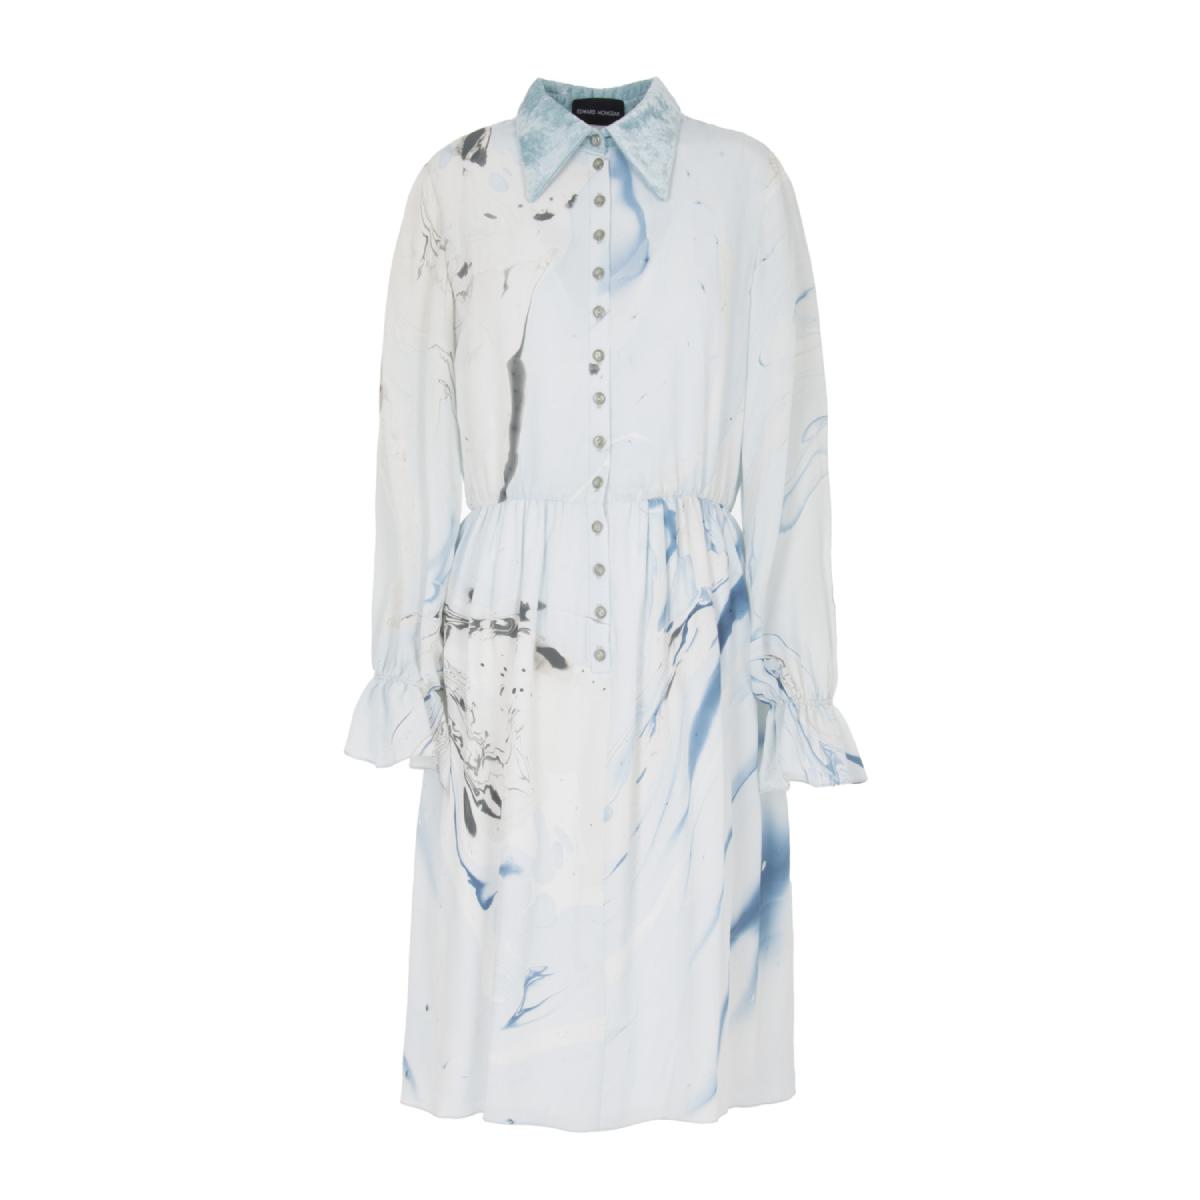 marbled button up dress